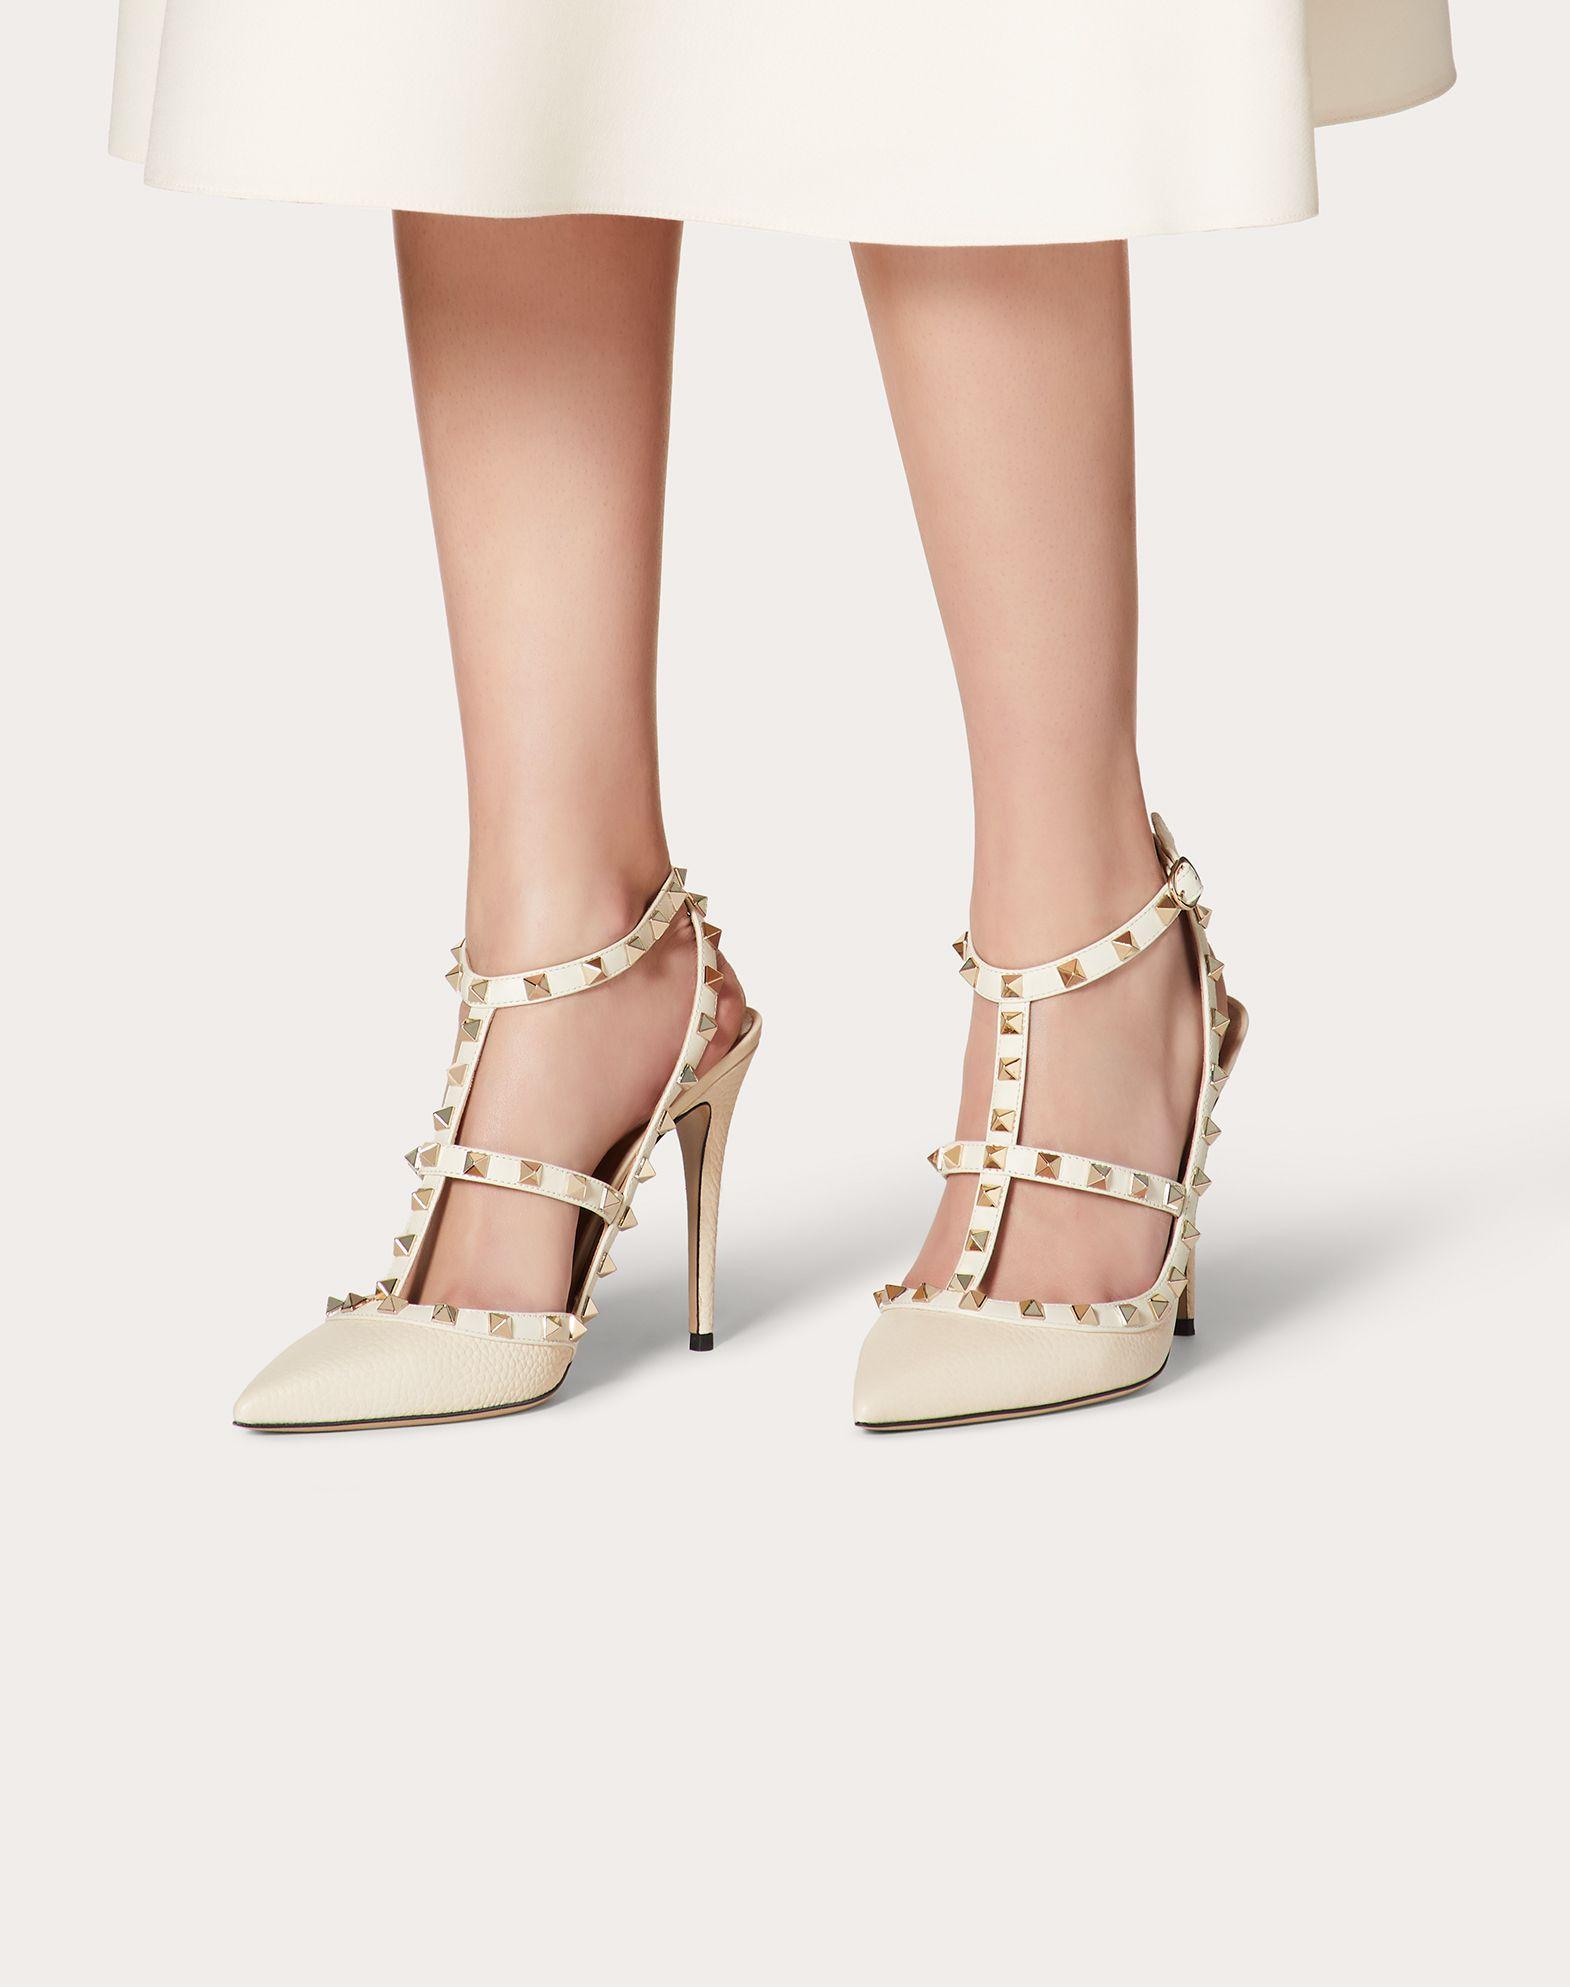 VALENTINO GARAVANI Rockstud Ankle Strap HIGH HEEL PUMPS D b